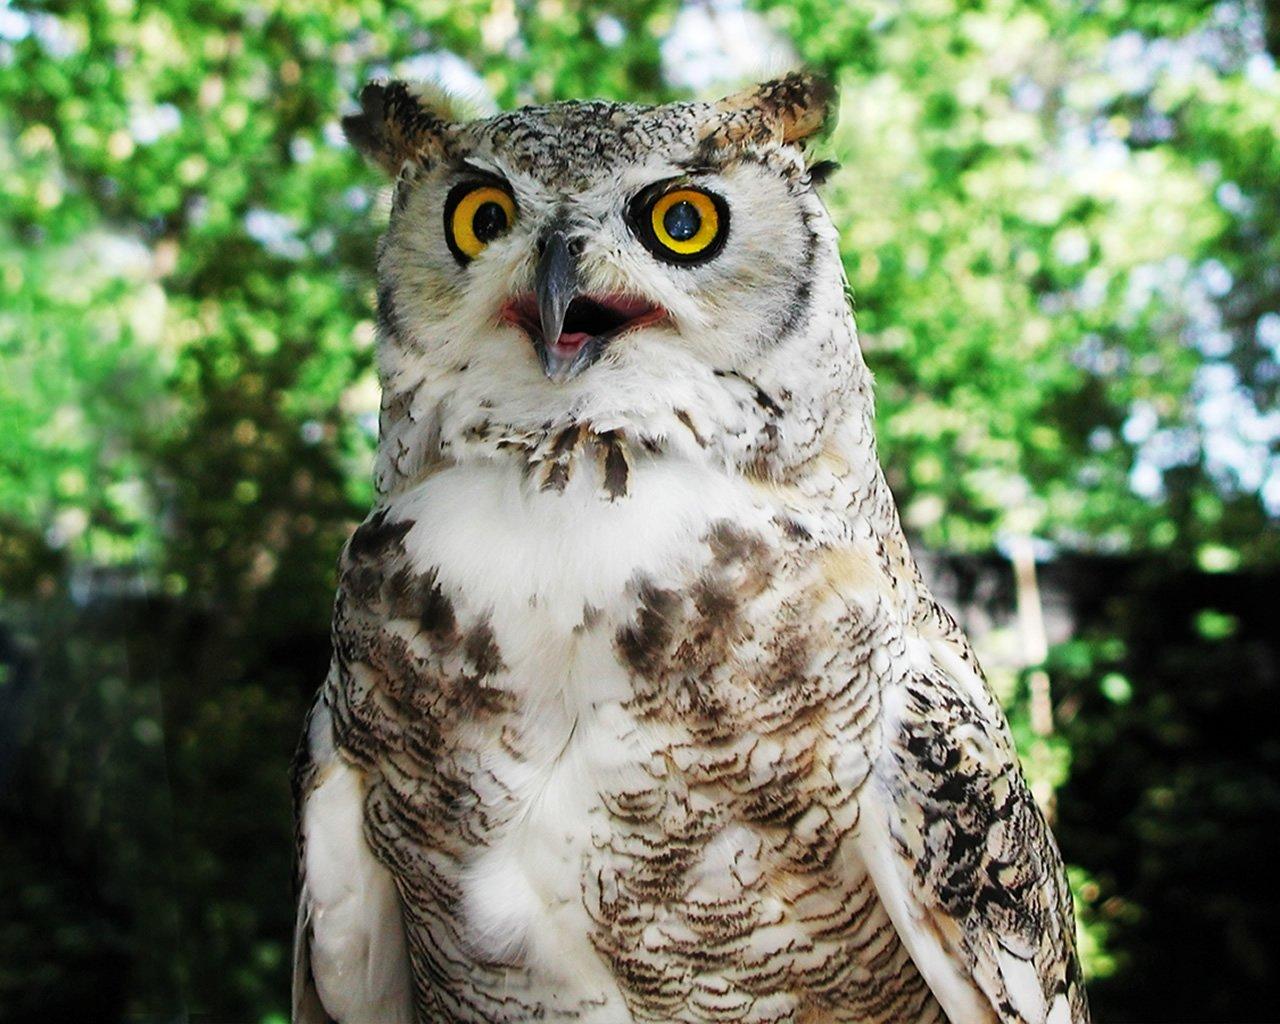 Hoot Owl Wallpaper - WallpaperSafari Owl City Ocean Eyes